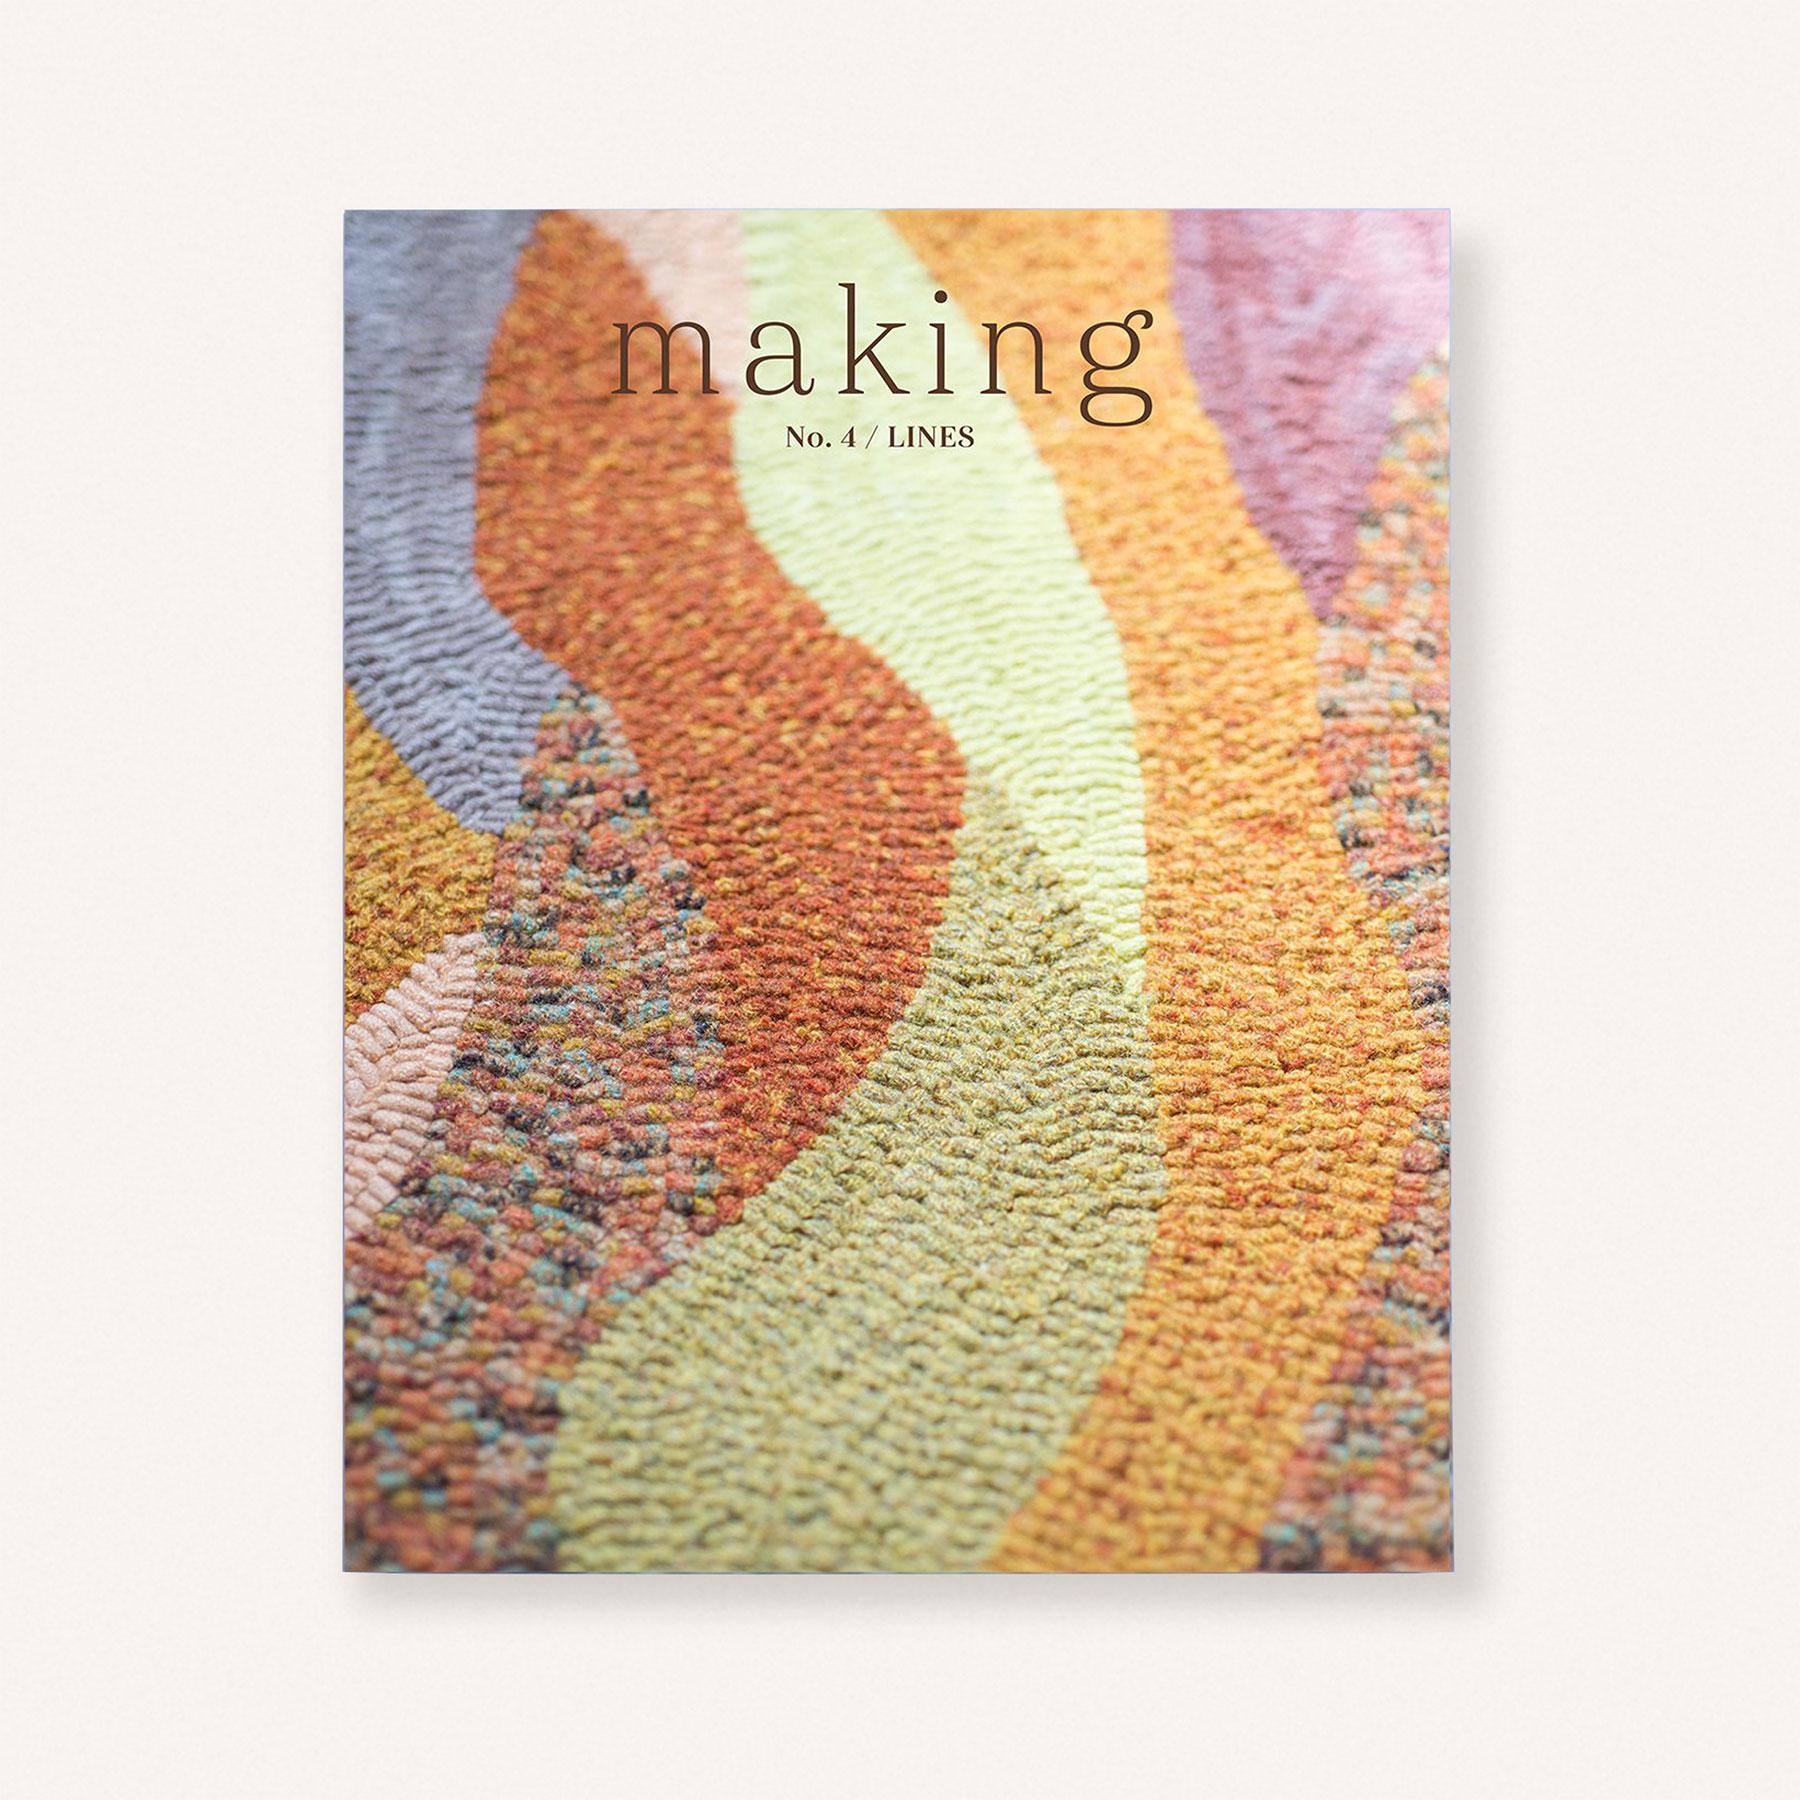 Making Magazine No. 4 / Lines